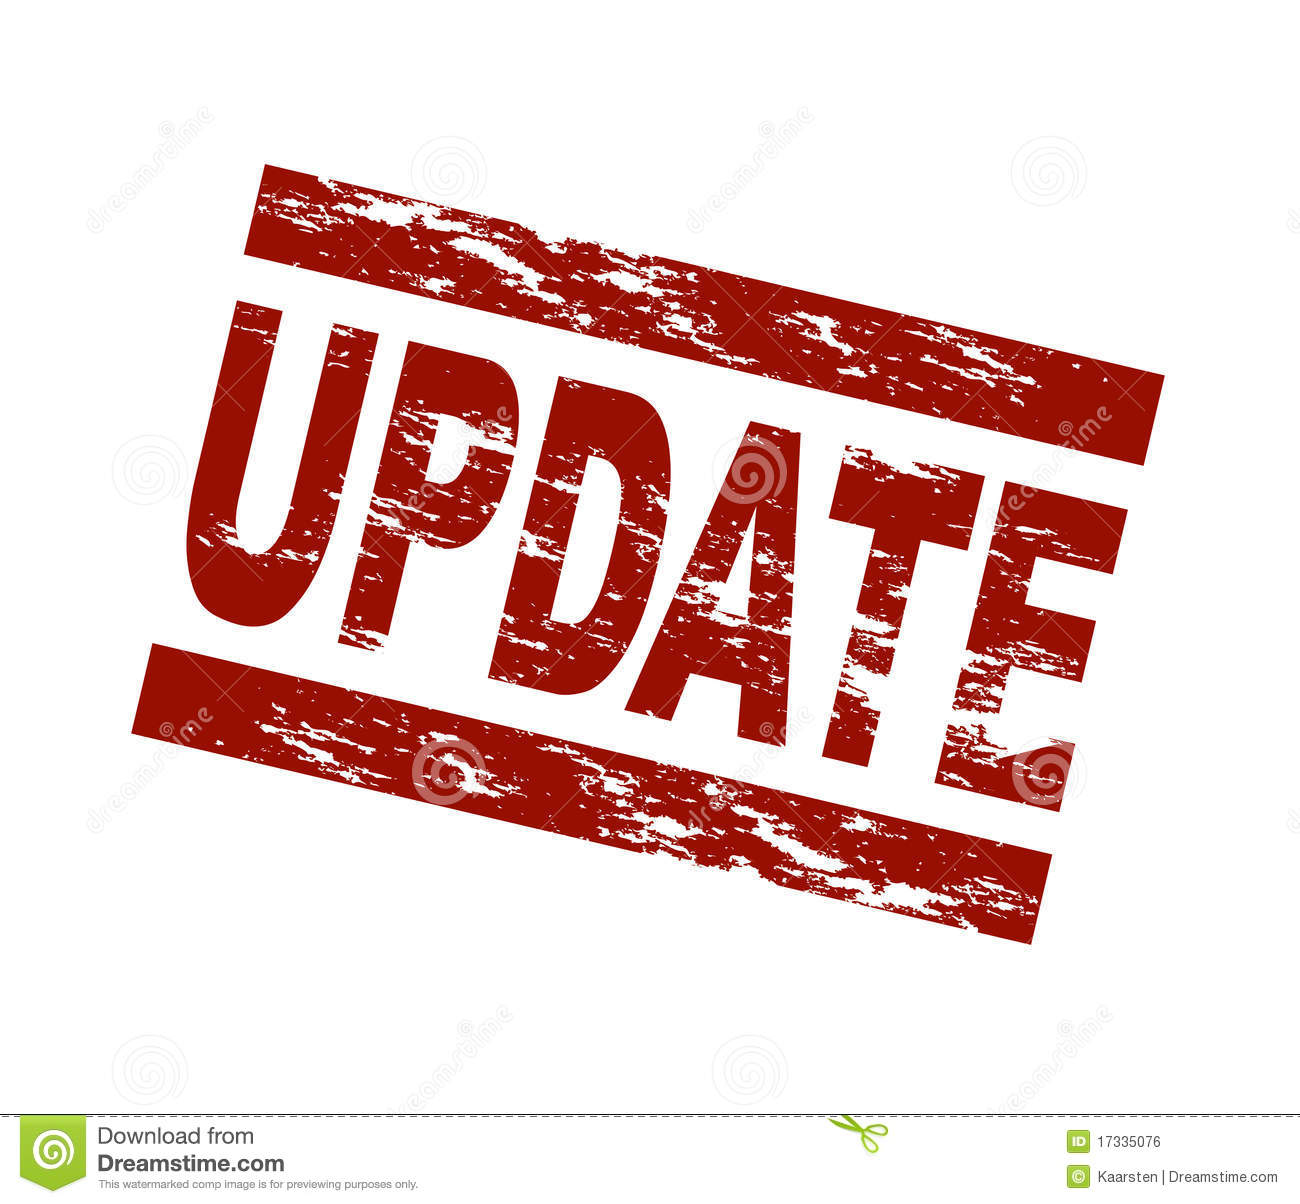 updateclipartupdate17335076.jpg